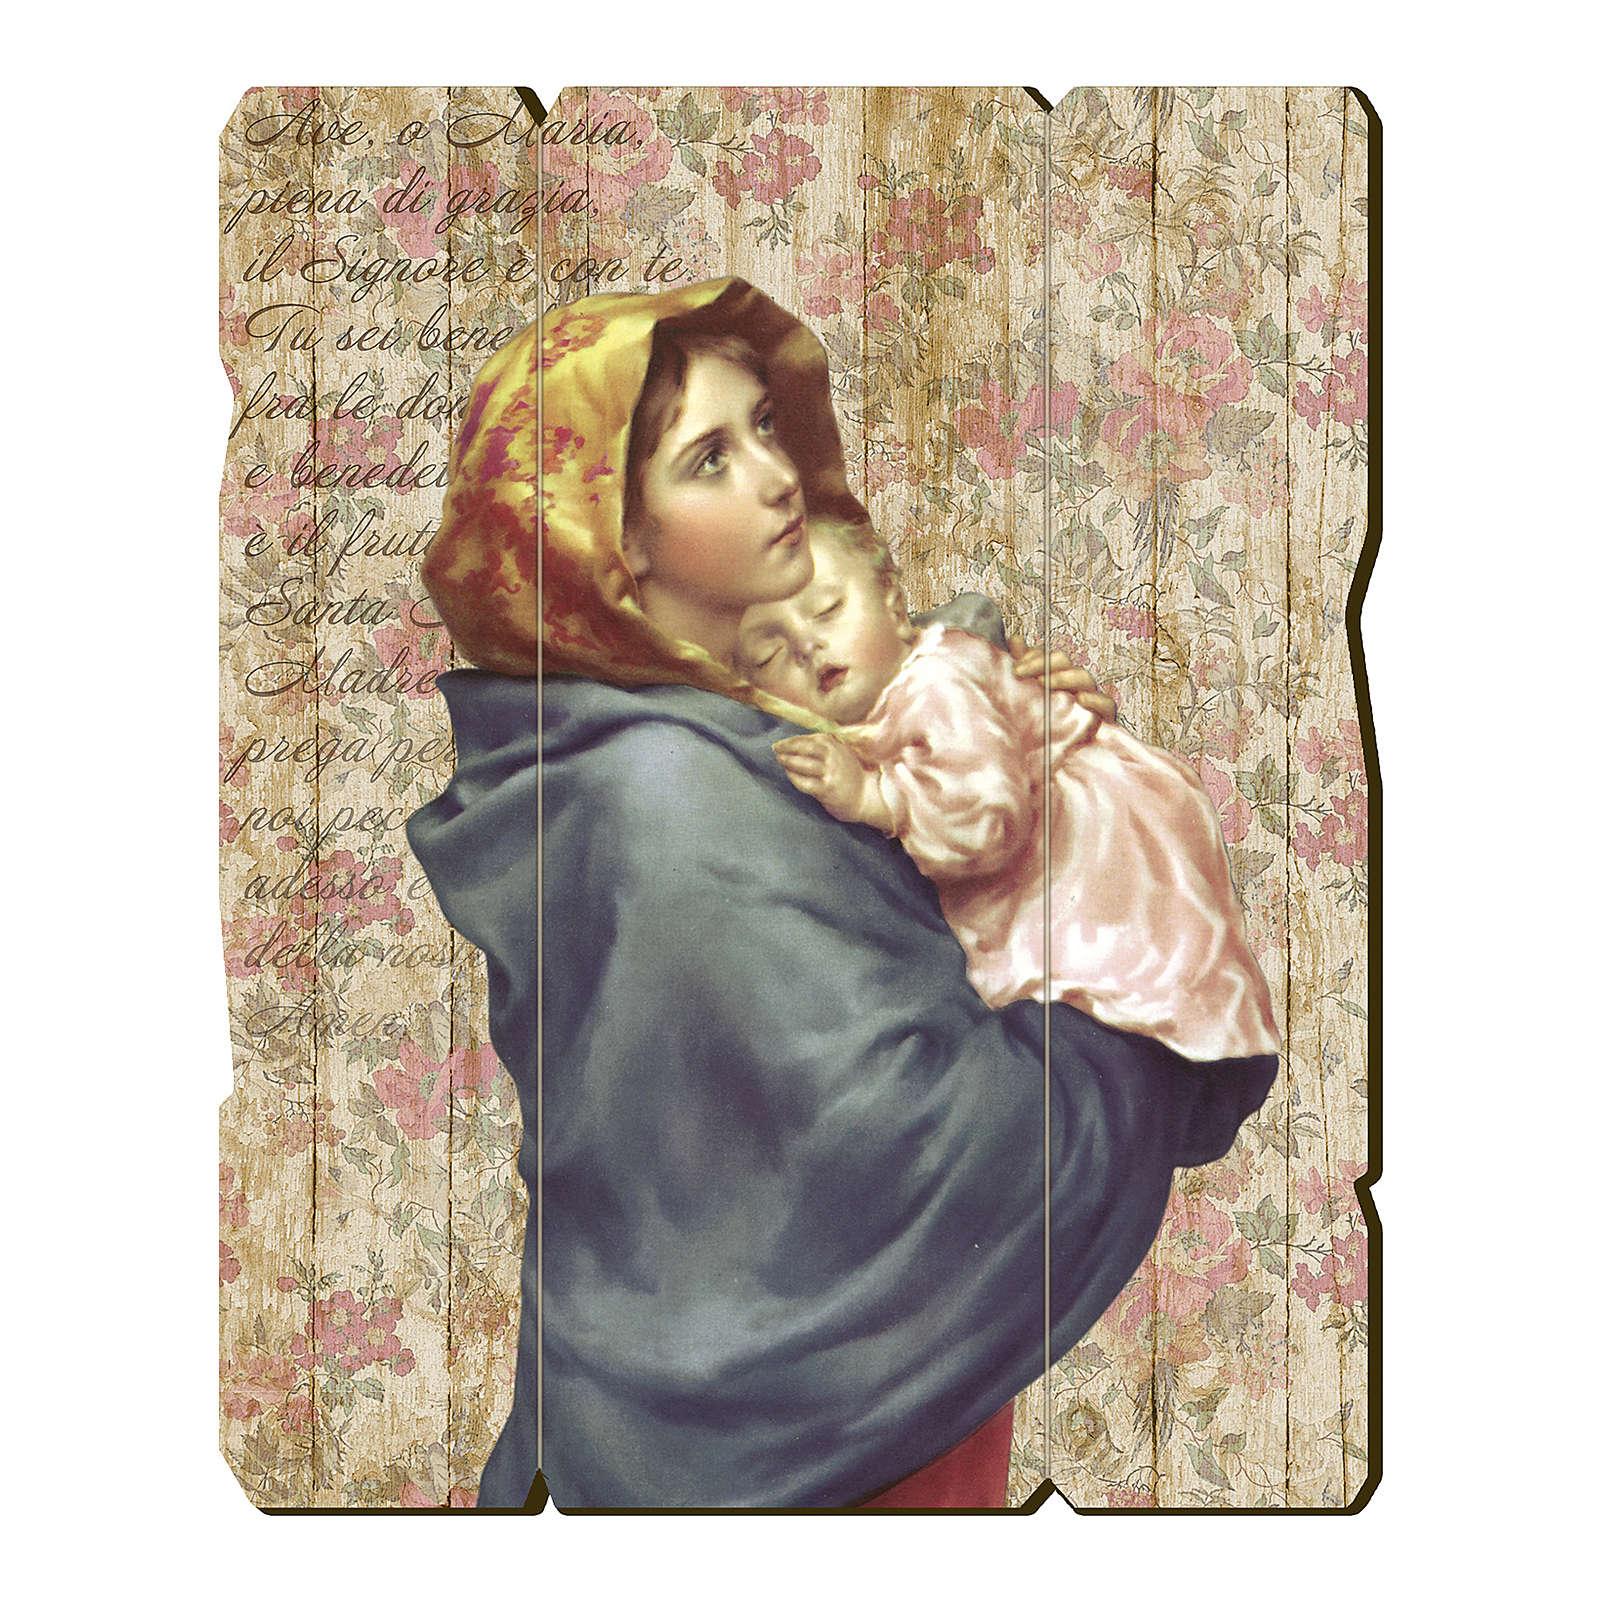 Cuadro madera perfilada gancho parte posterior Virgen Niño Ferruzzi 3